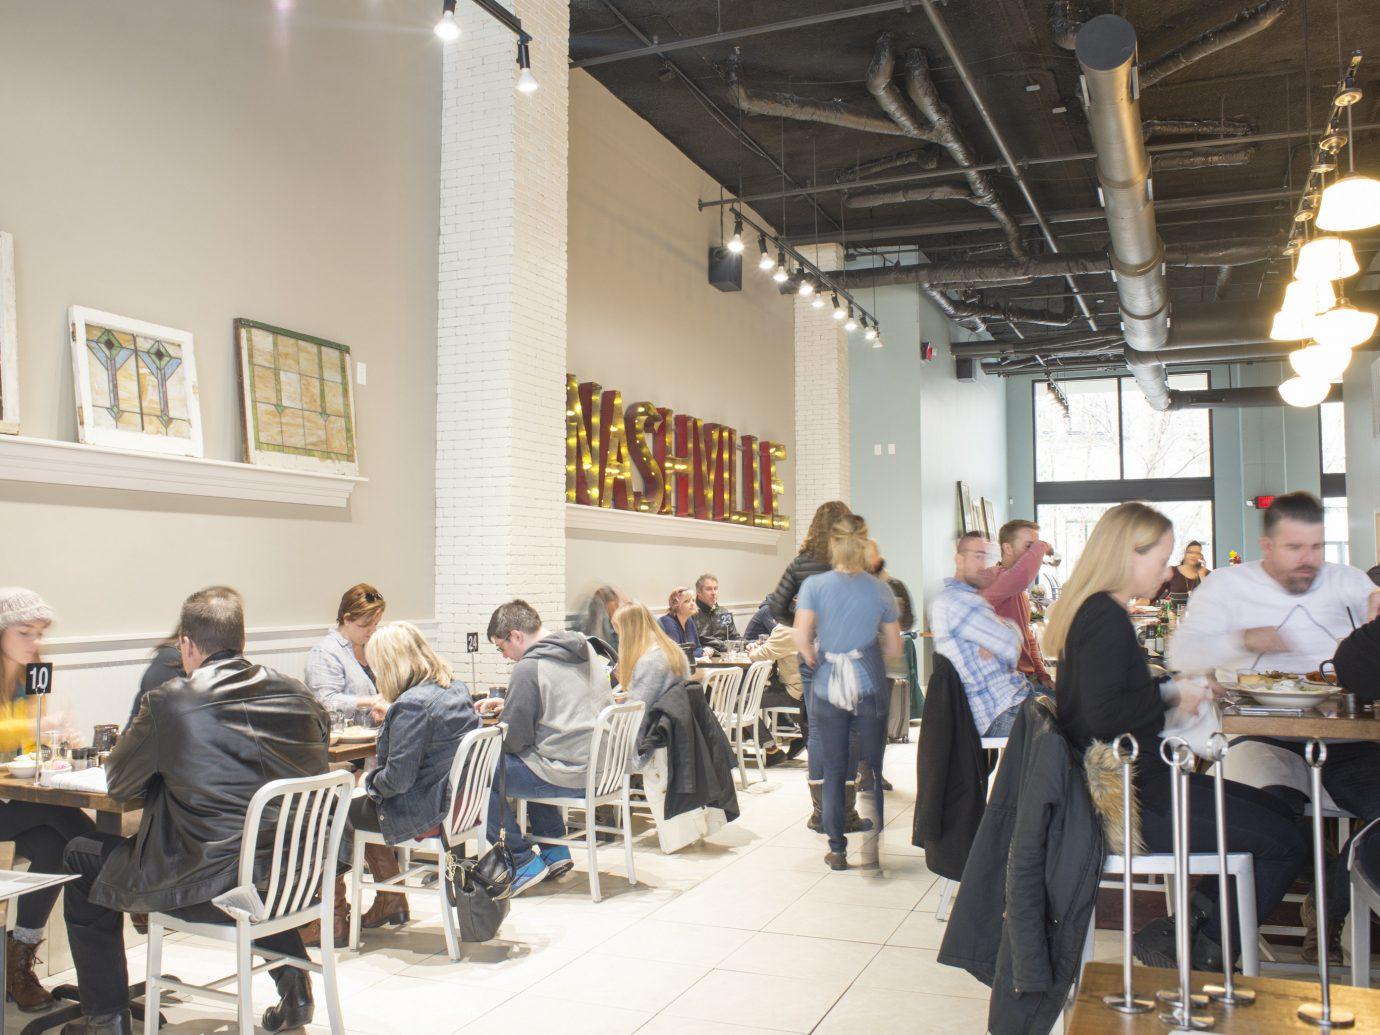 Food + Drink Trip Ideas Weekend Getaways indoor person ceiling group people meal restaurant dining table dining room